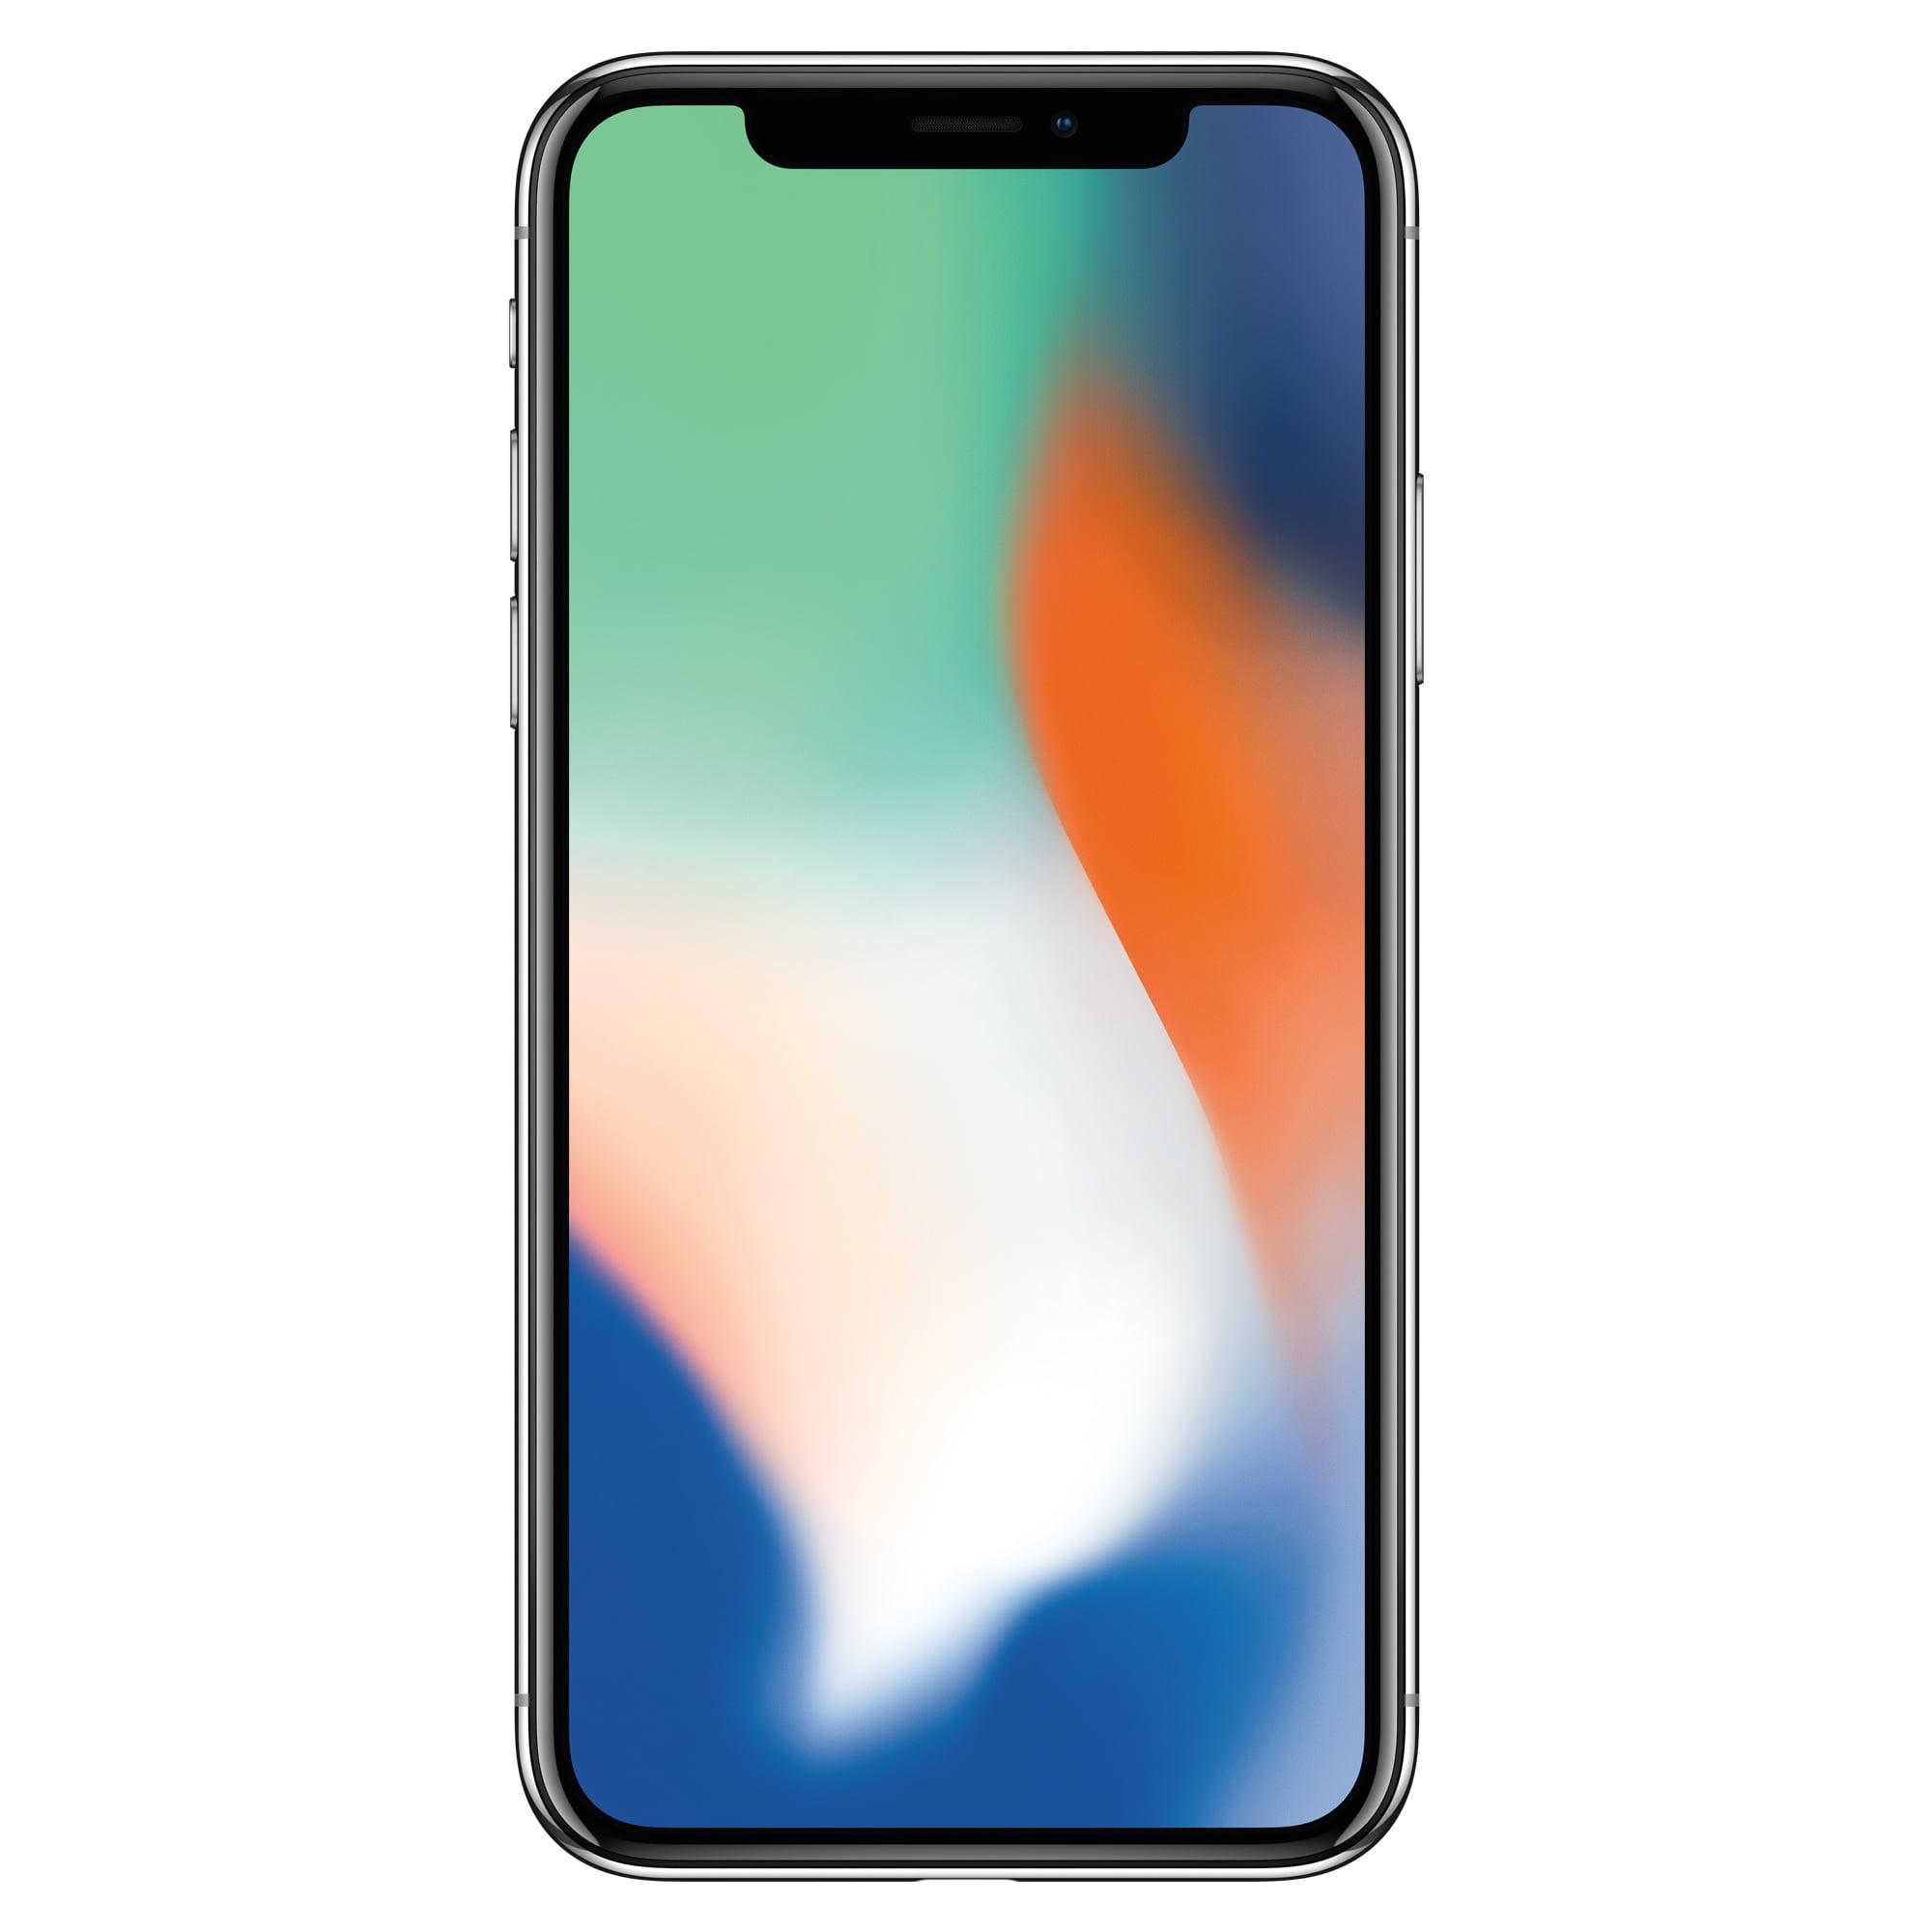 Straight Talk Apple iPhone X 64GB, Prepaid Smartphone, Space Gray